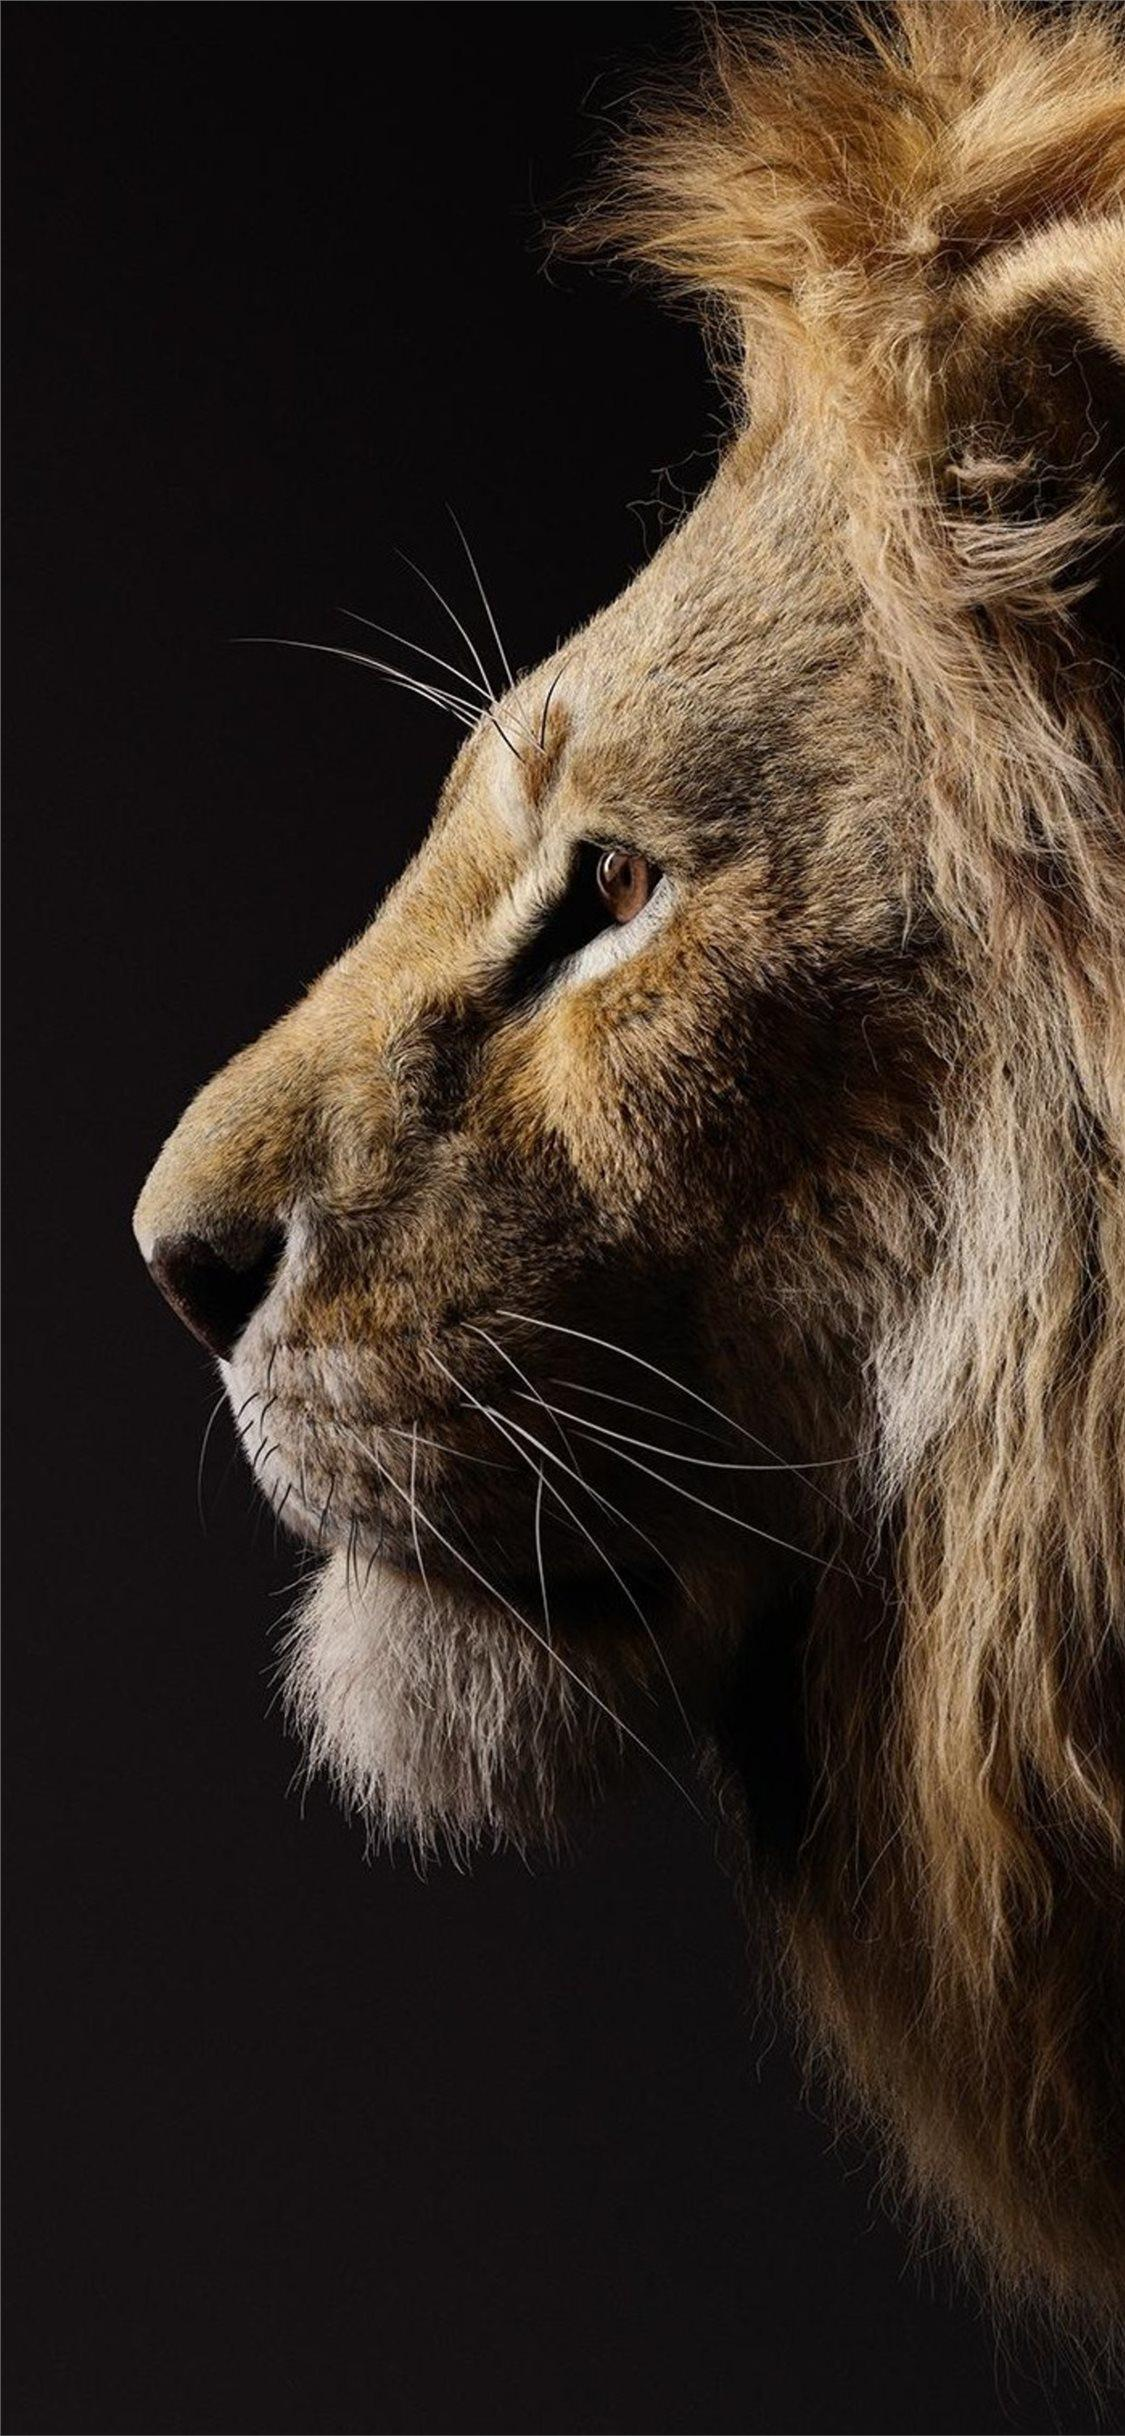 Lion King Iphone Lock Screen Lion Wallpaper Hd Novocom Top